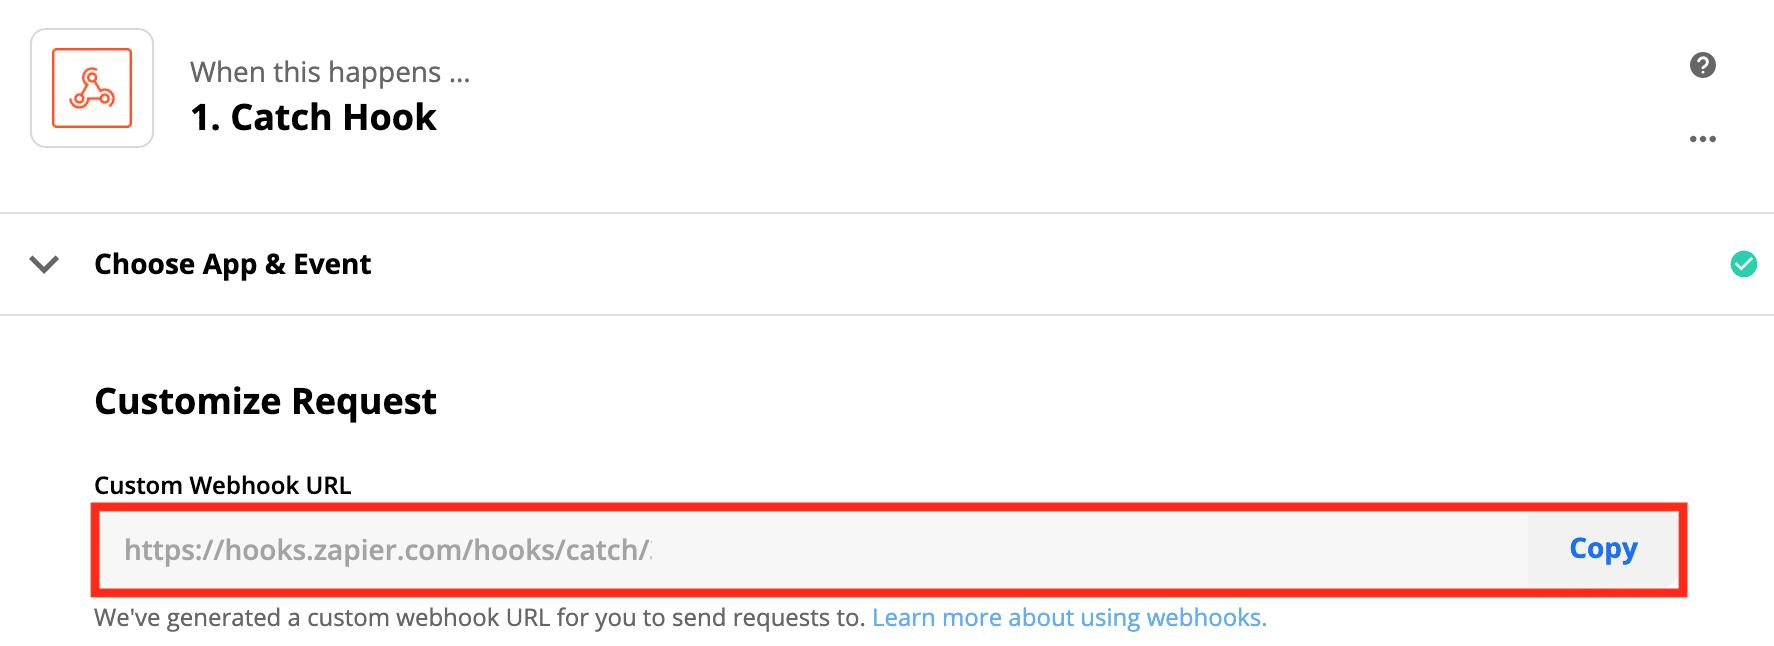 Custom Webhook URLをコピーする